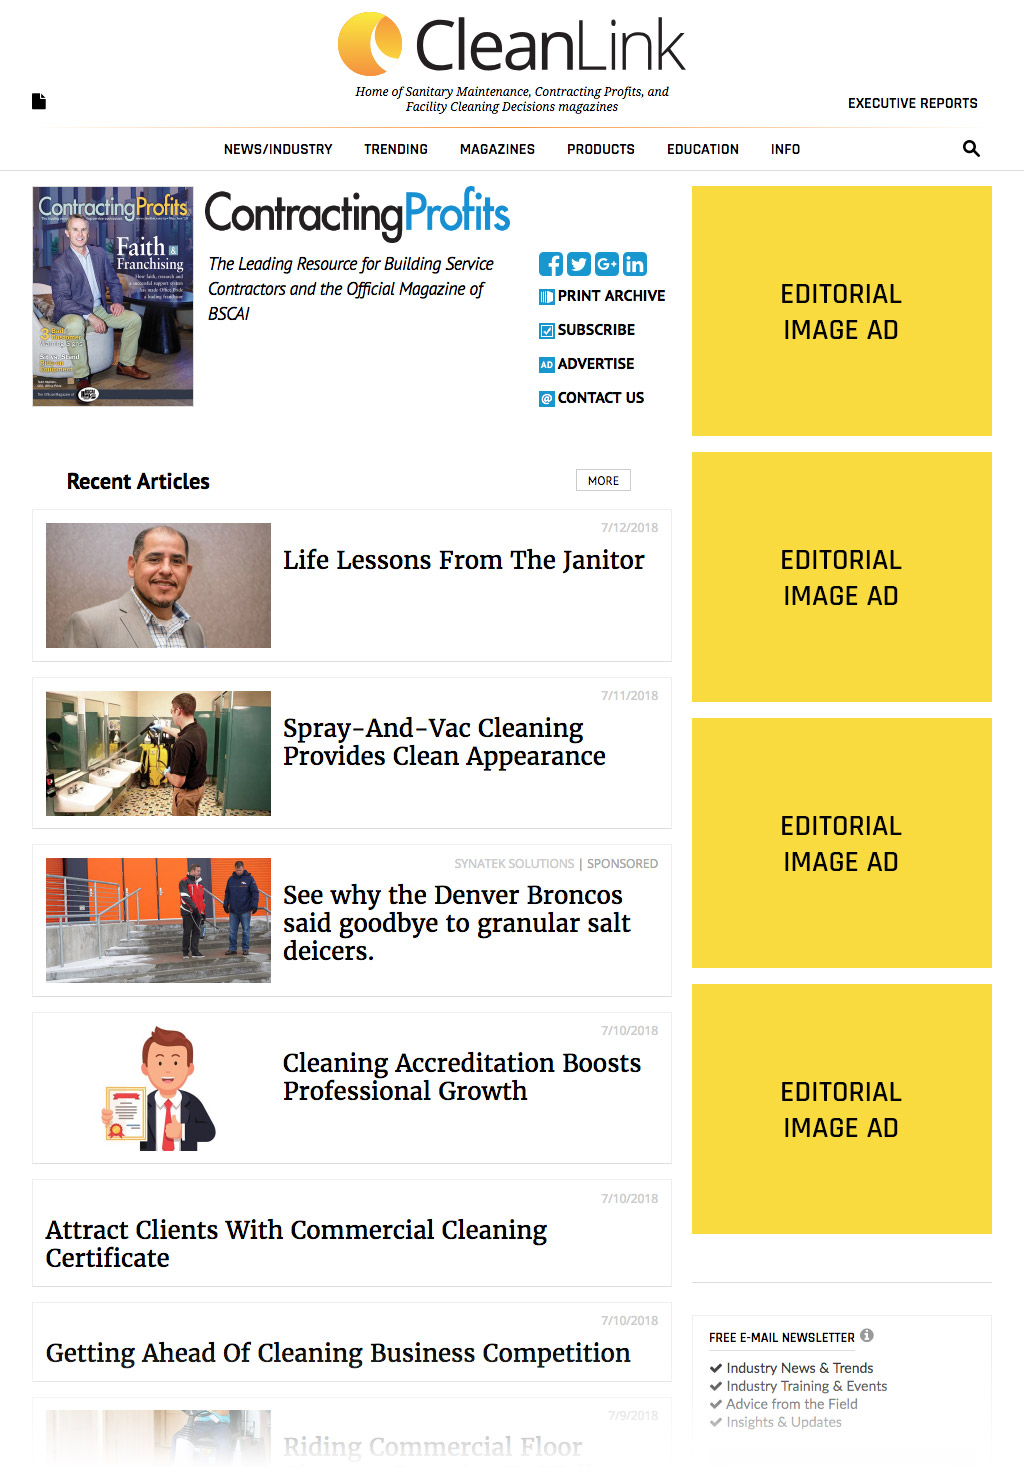 Editorial Image Ad Sample